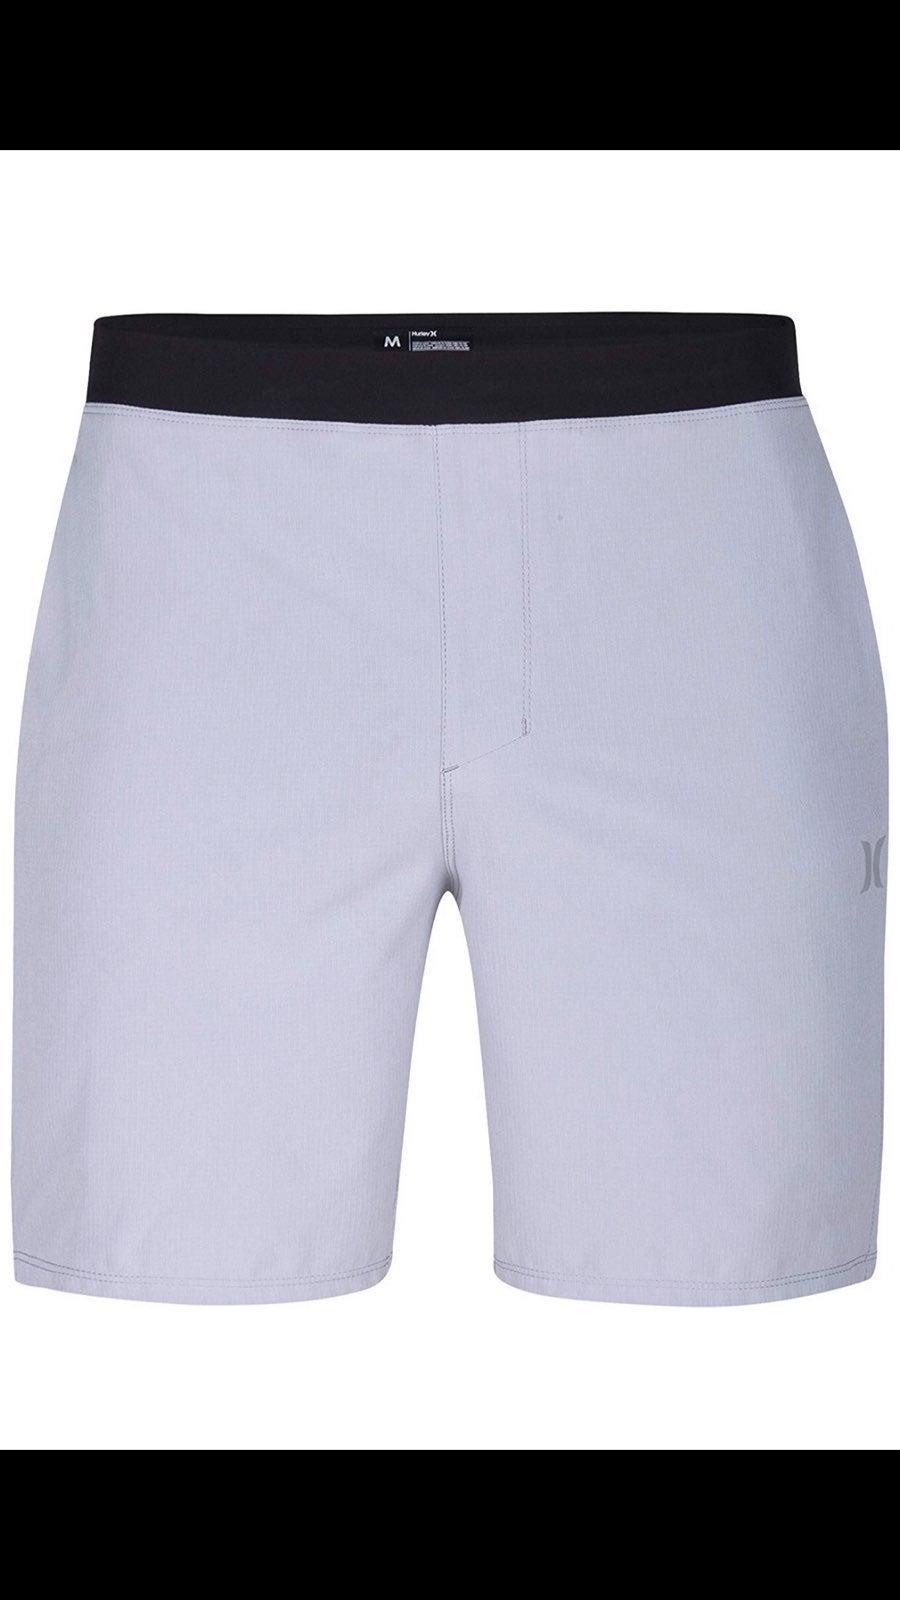 NWT Hurley Alpha Trainer Shorts